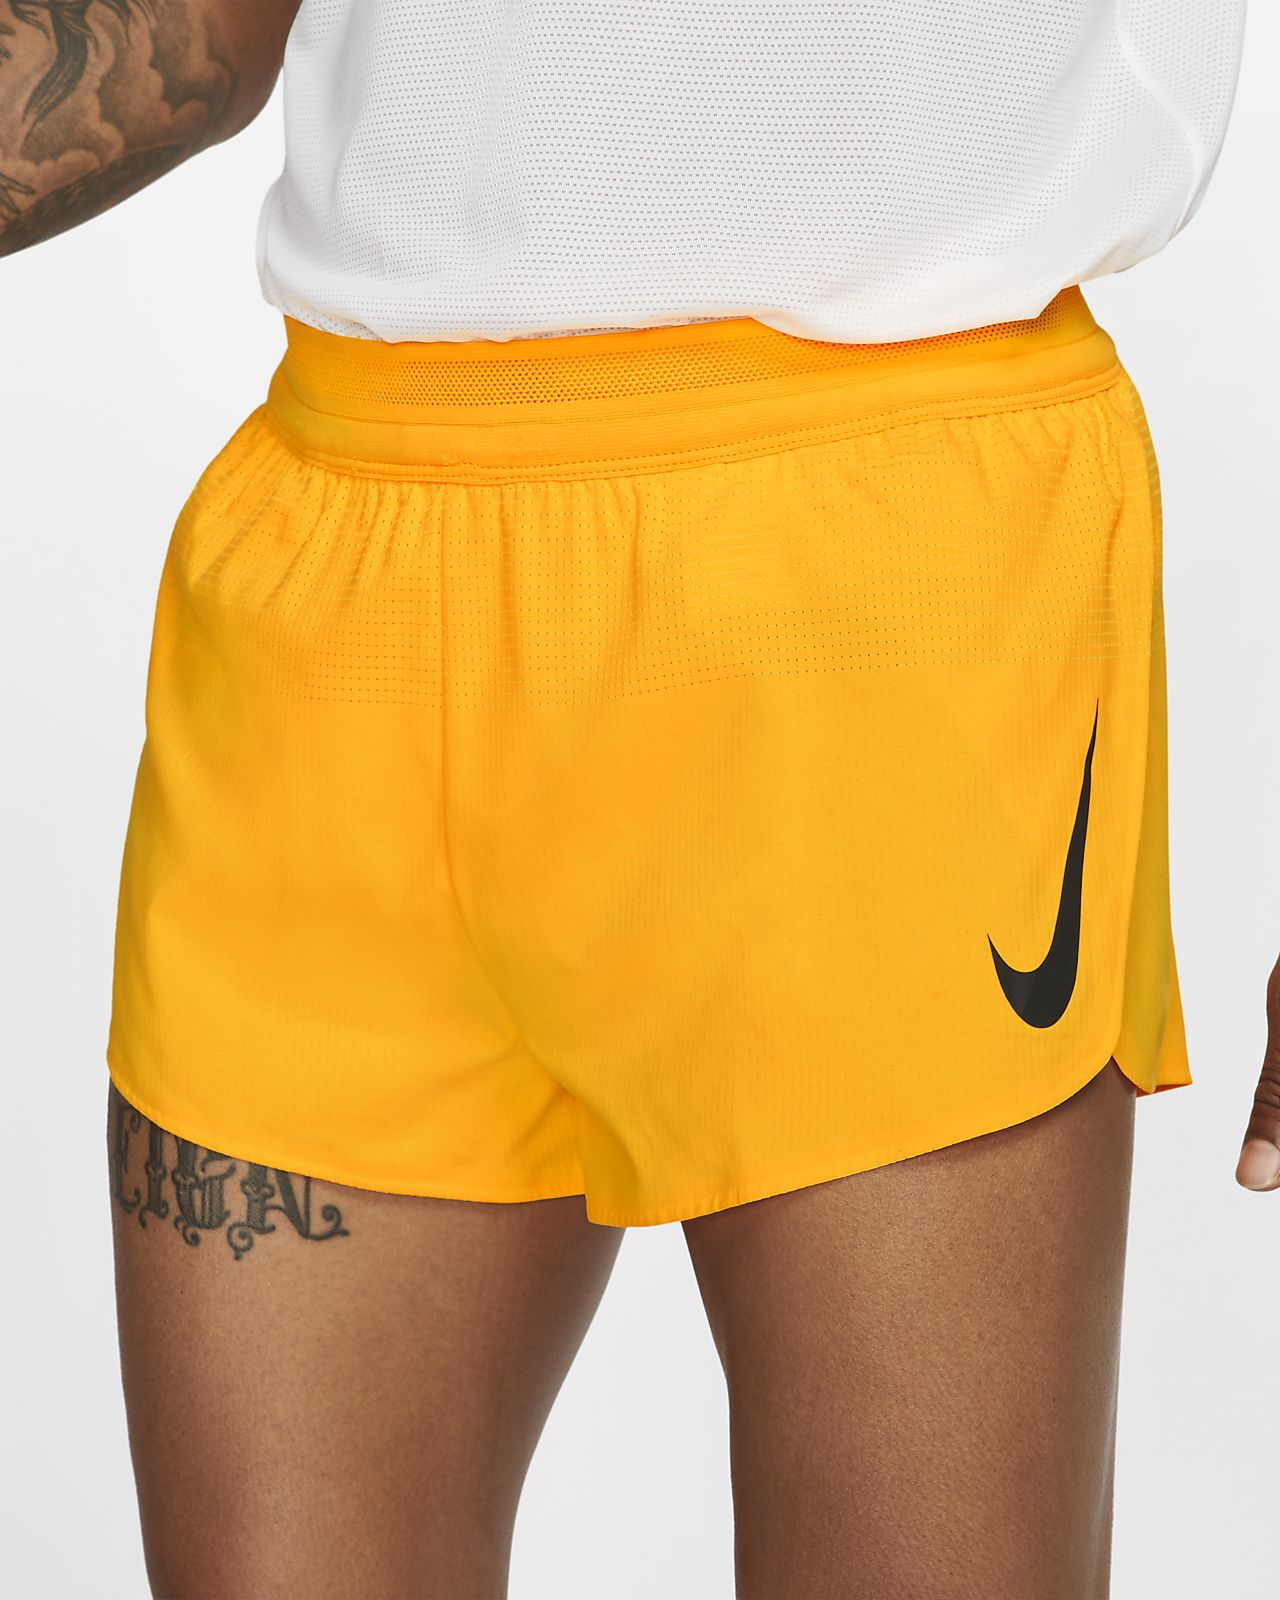 Short de running Nike AeroSwift (London) 5 cm pour Homme